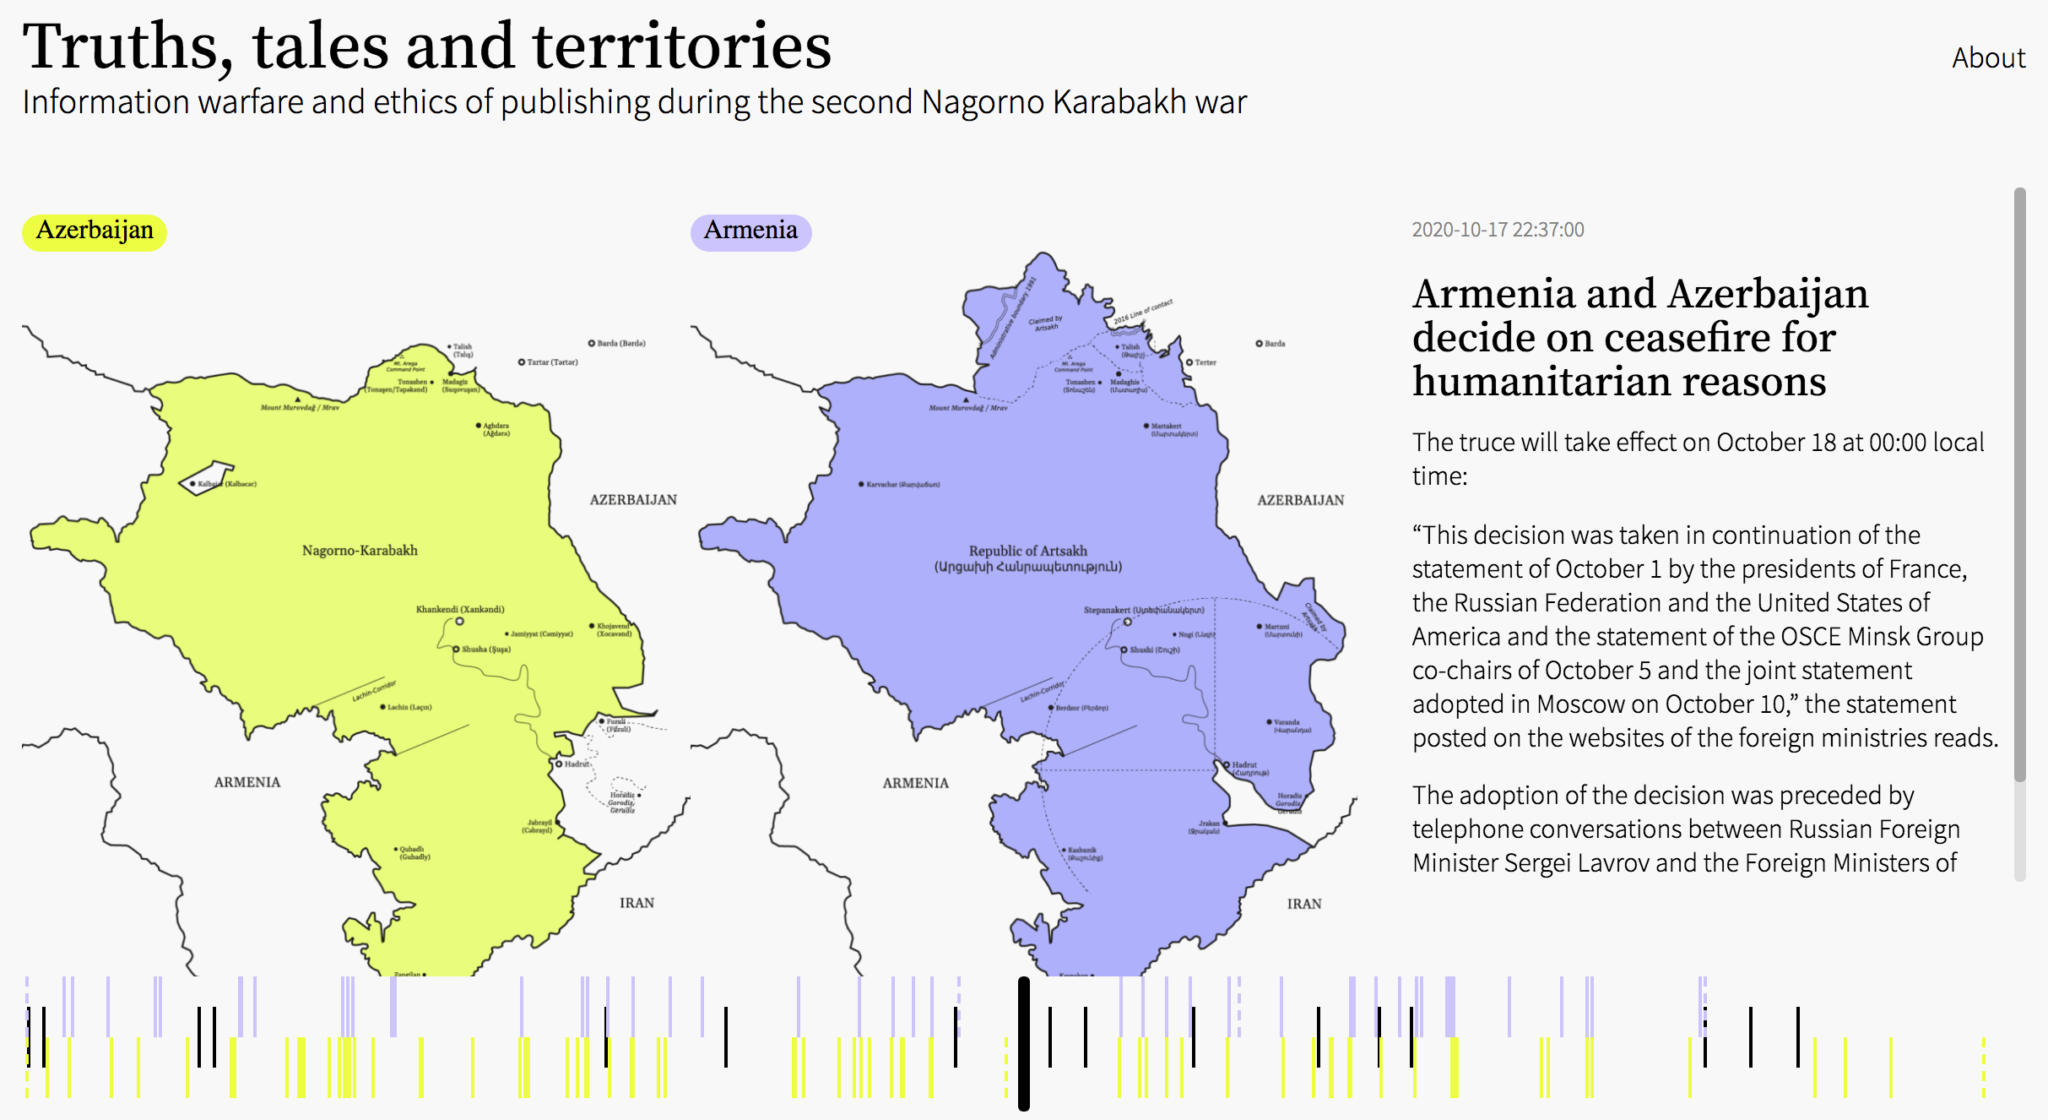 screenshot http://nagorno-karabakh.rectangle.design/